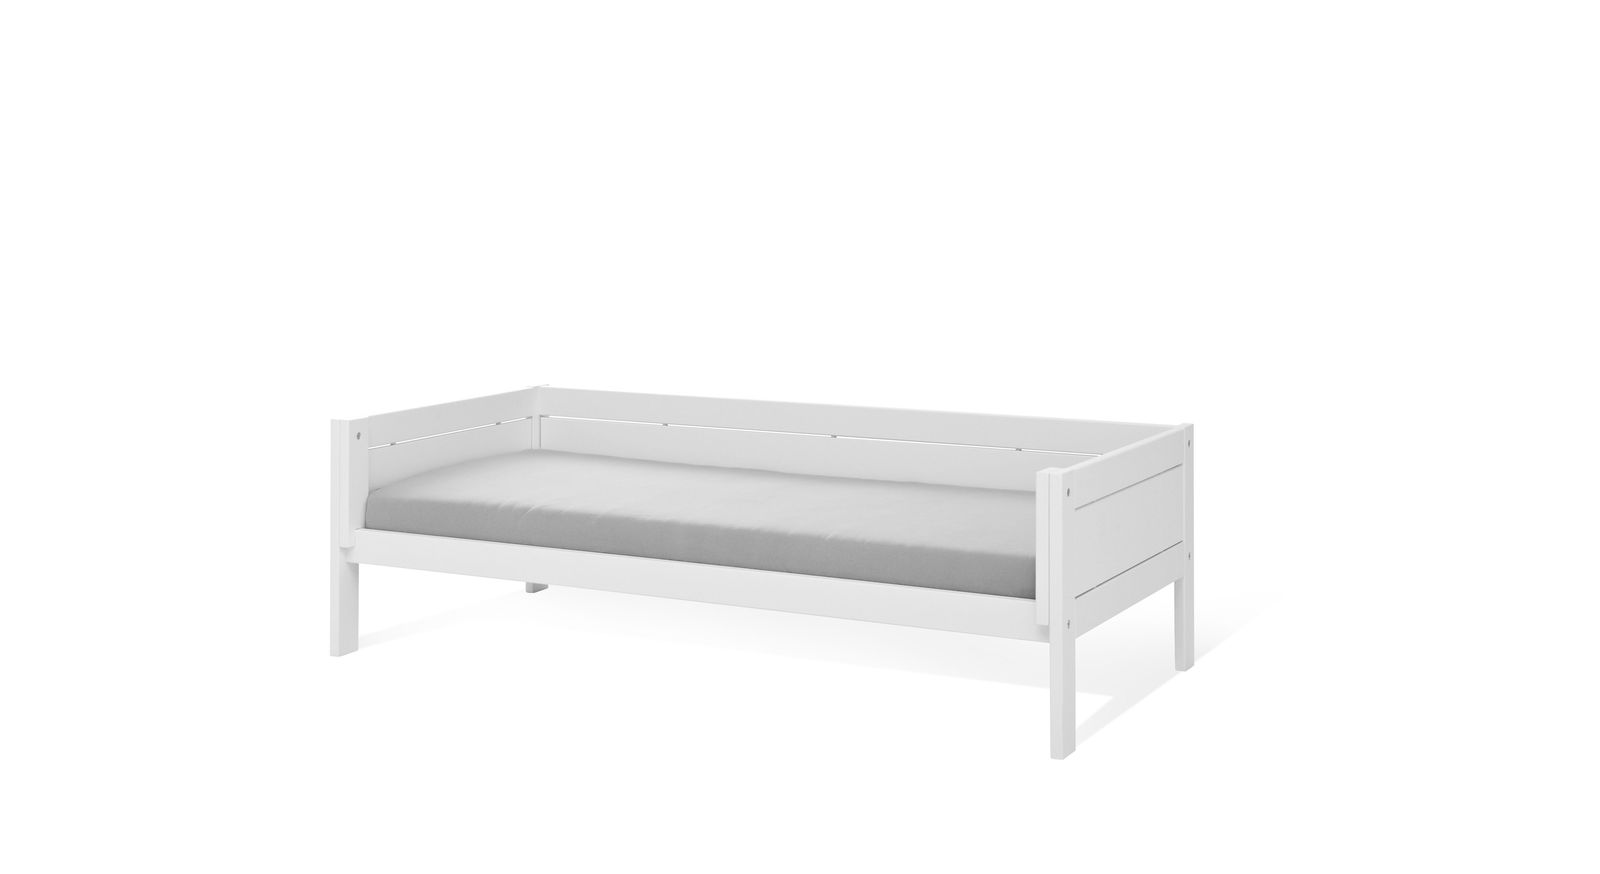 Jugendbett-Variante der 4-in-1 LIFETIME Kinderbetten